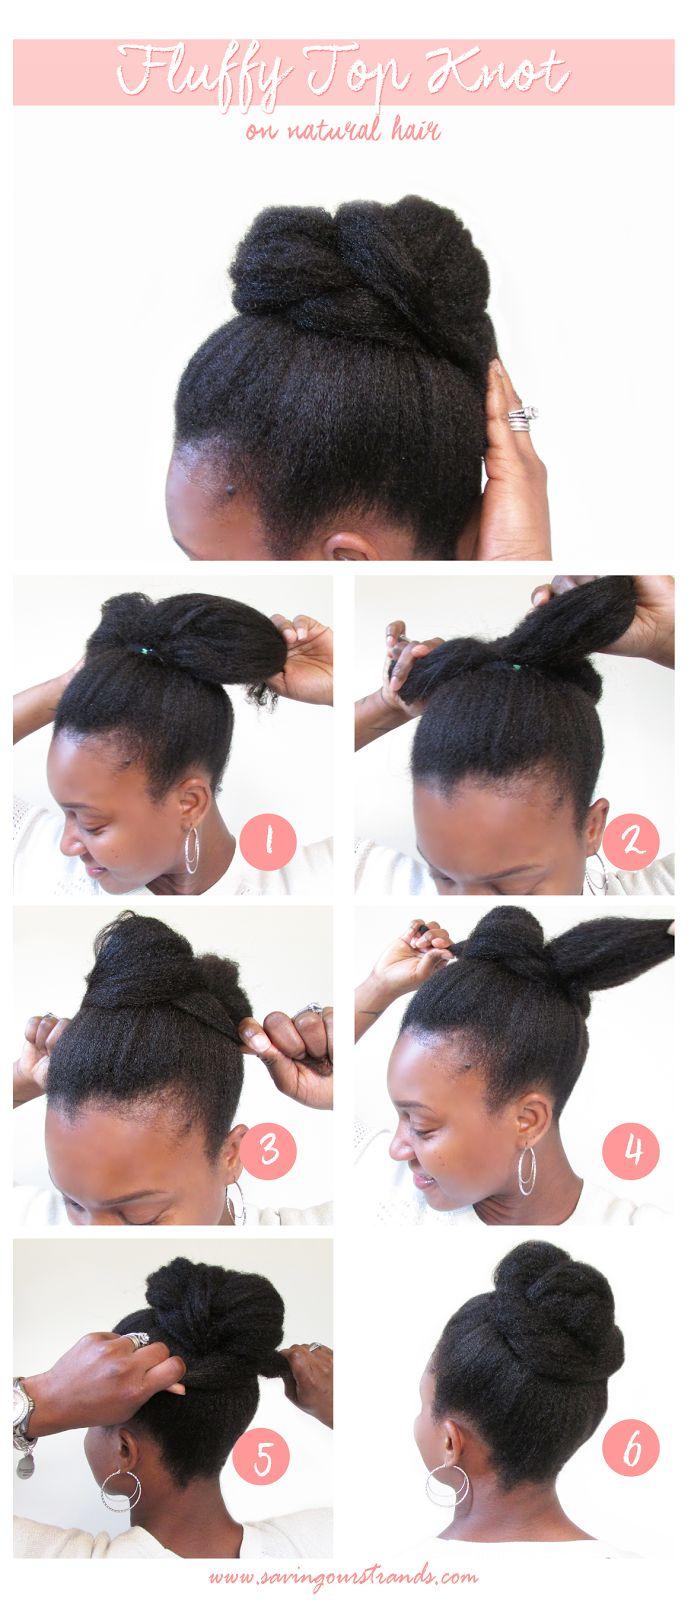 SavingOurStrands: A Healthy Hair Quest